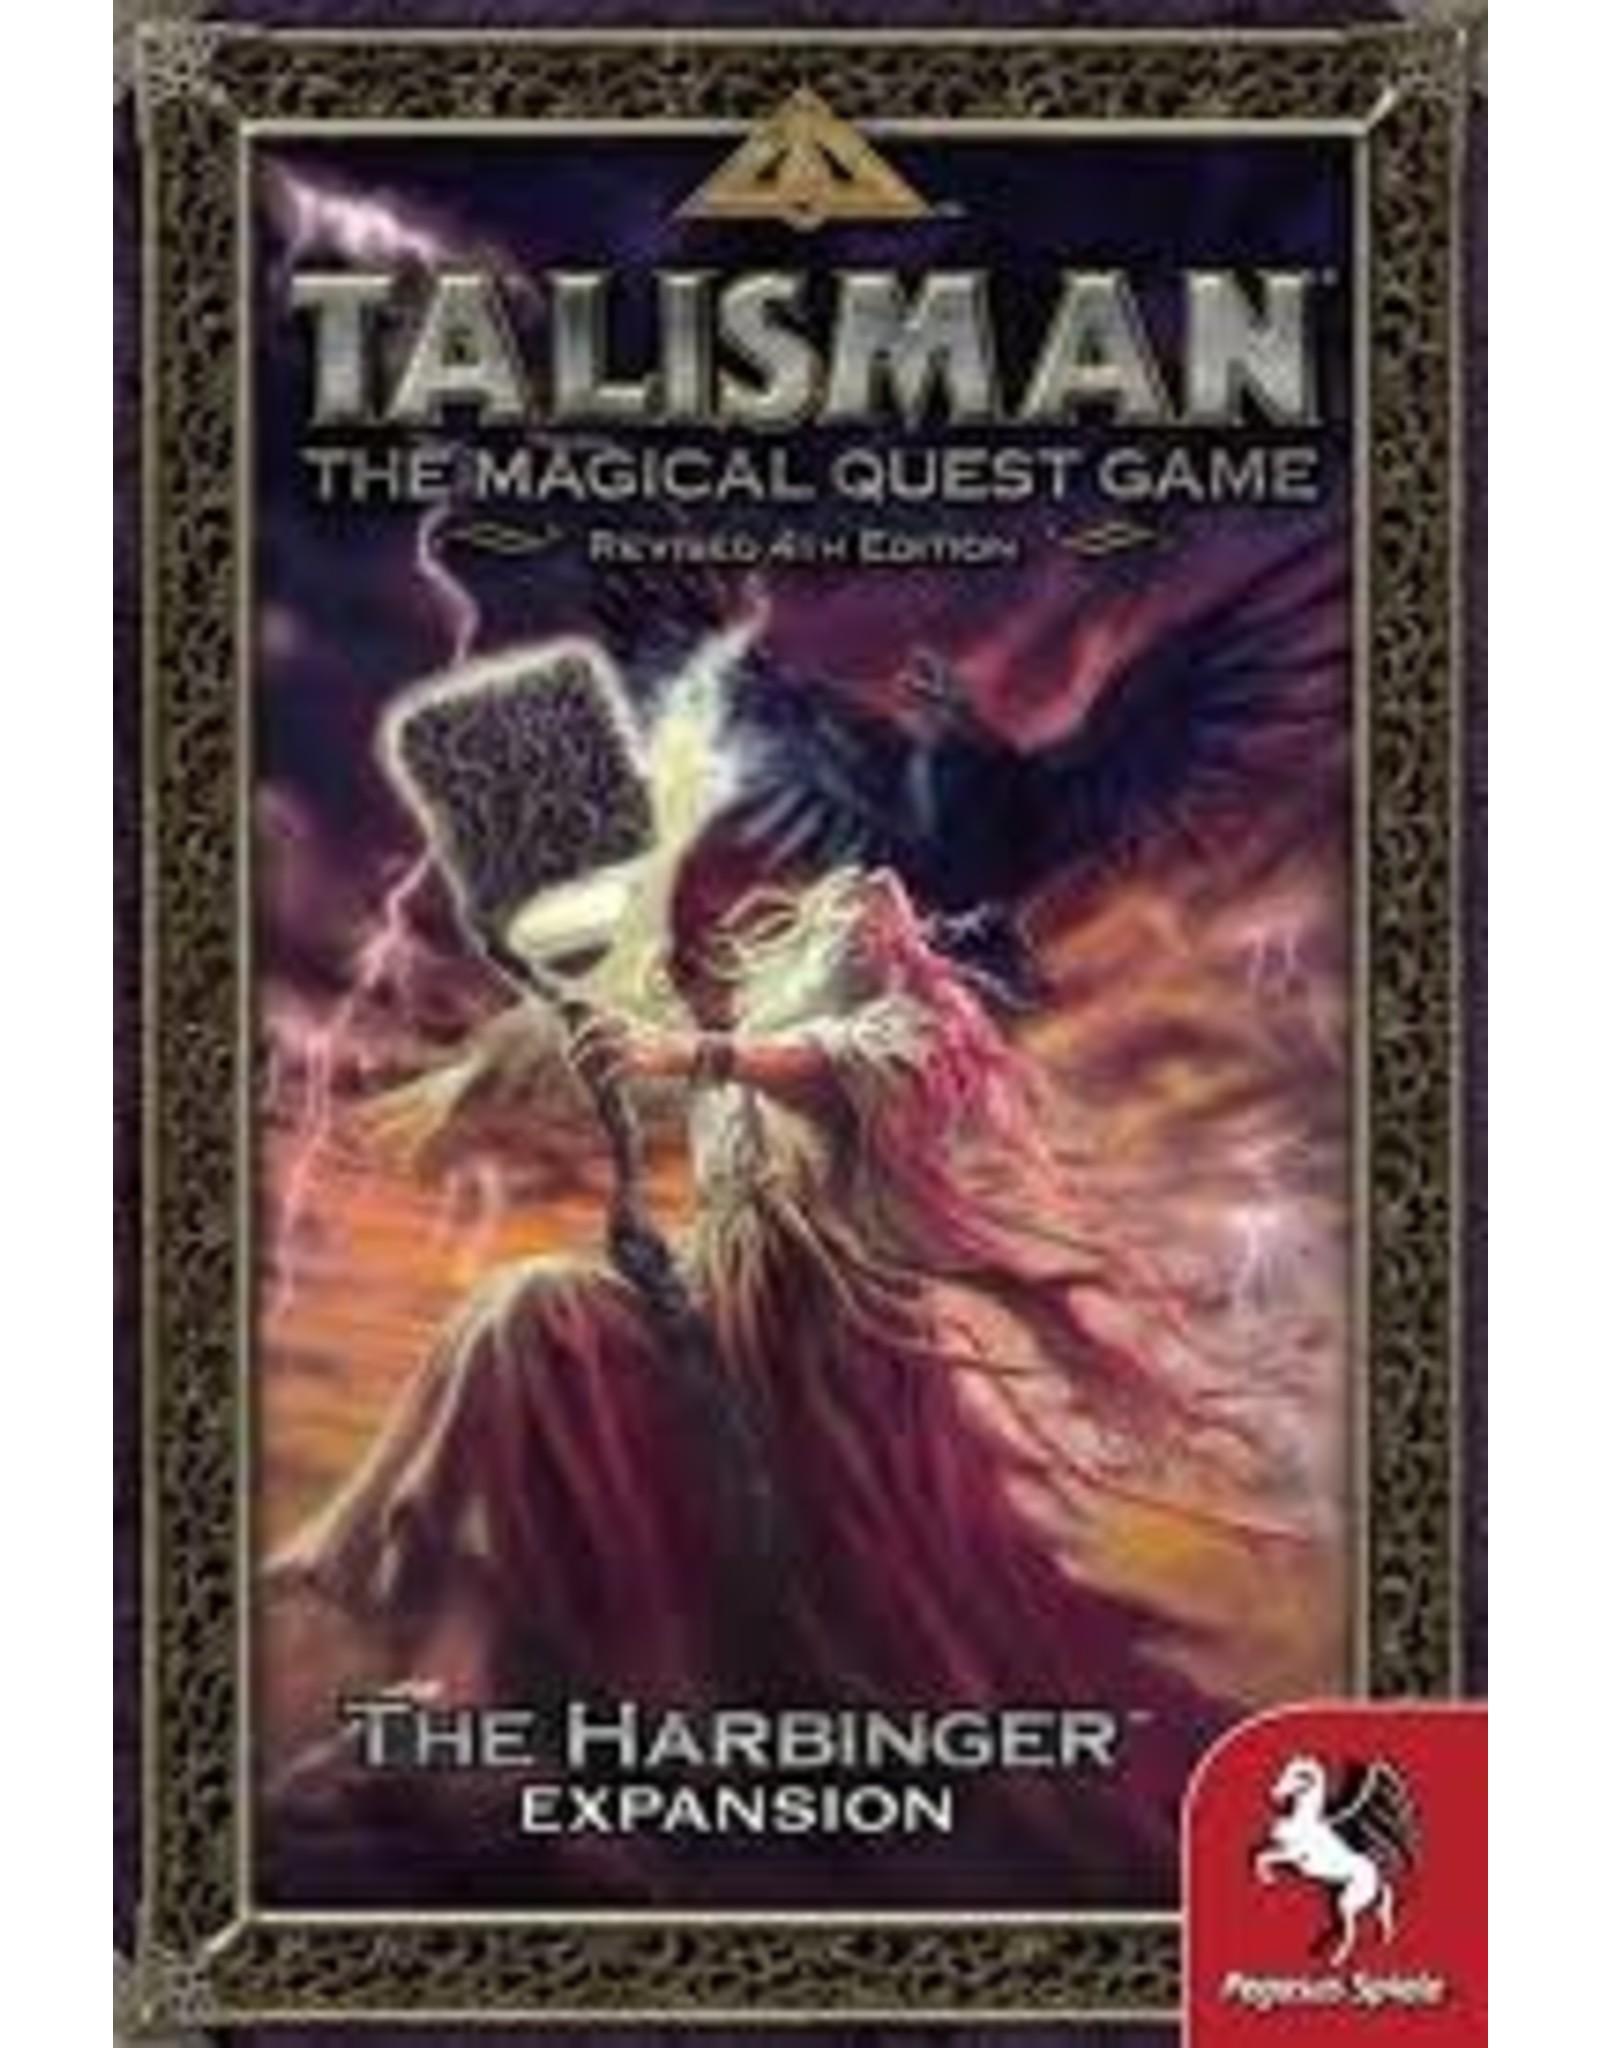 Talisman Expansion The Harbinger